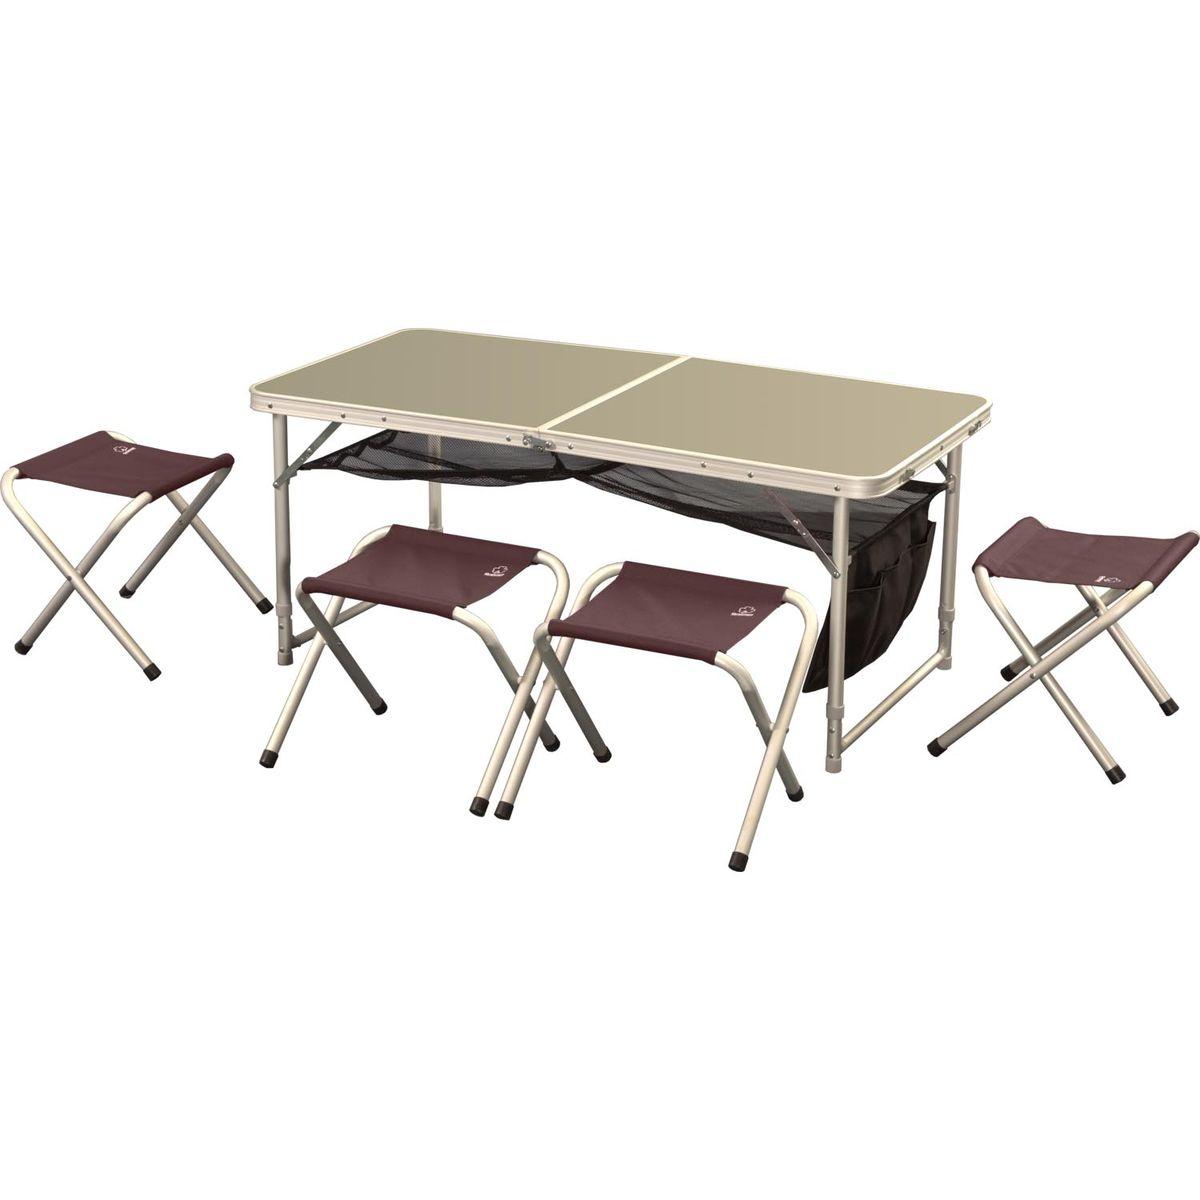 Набор складной мебели Greenell FTFS-1, 5 предметов палатки greenell палатка дом 2